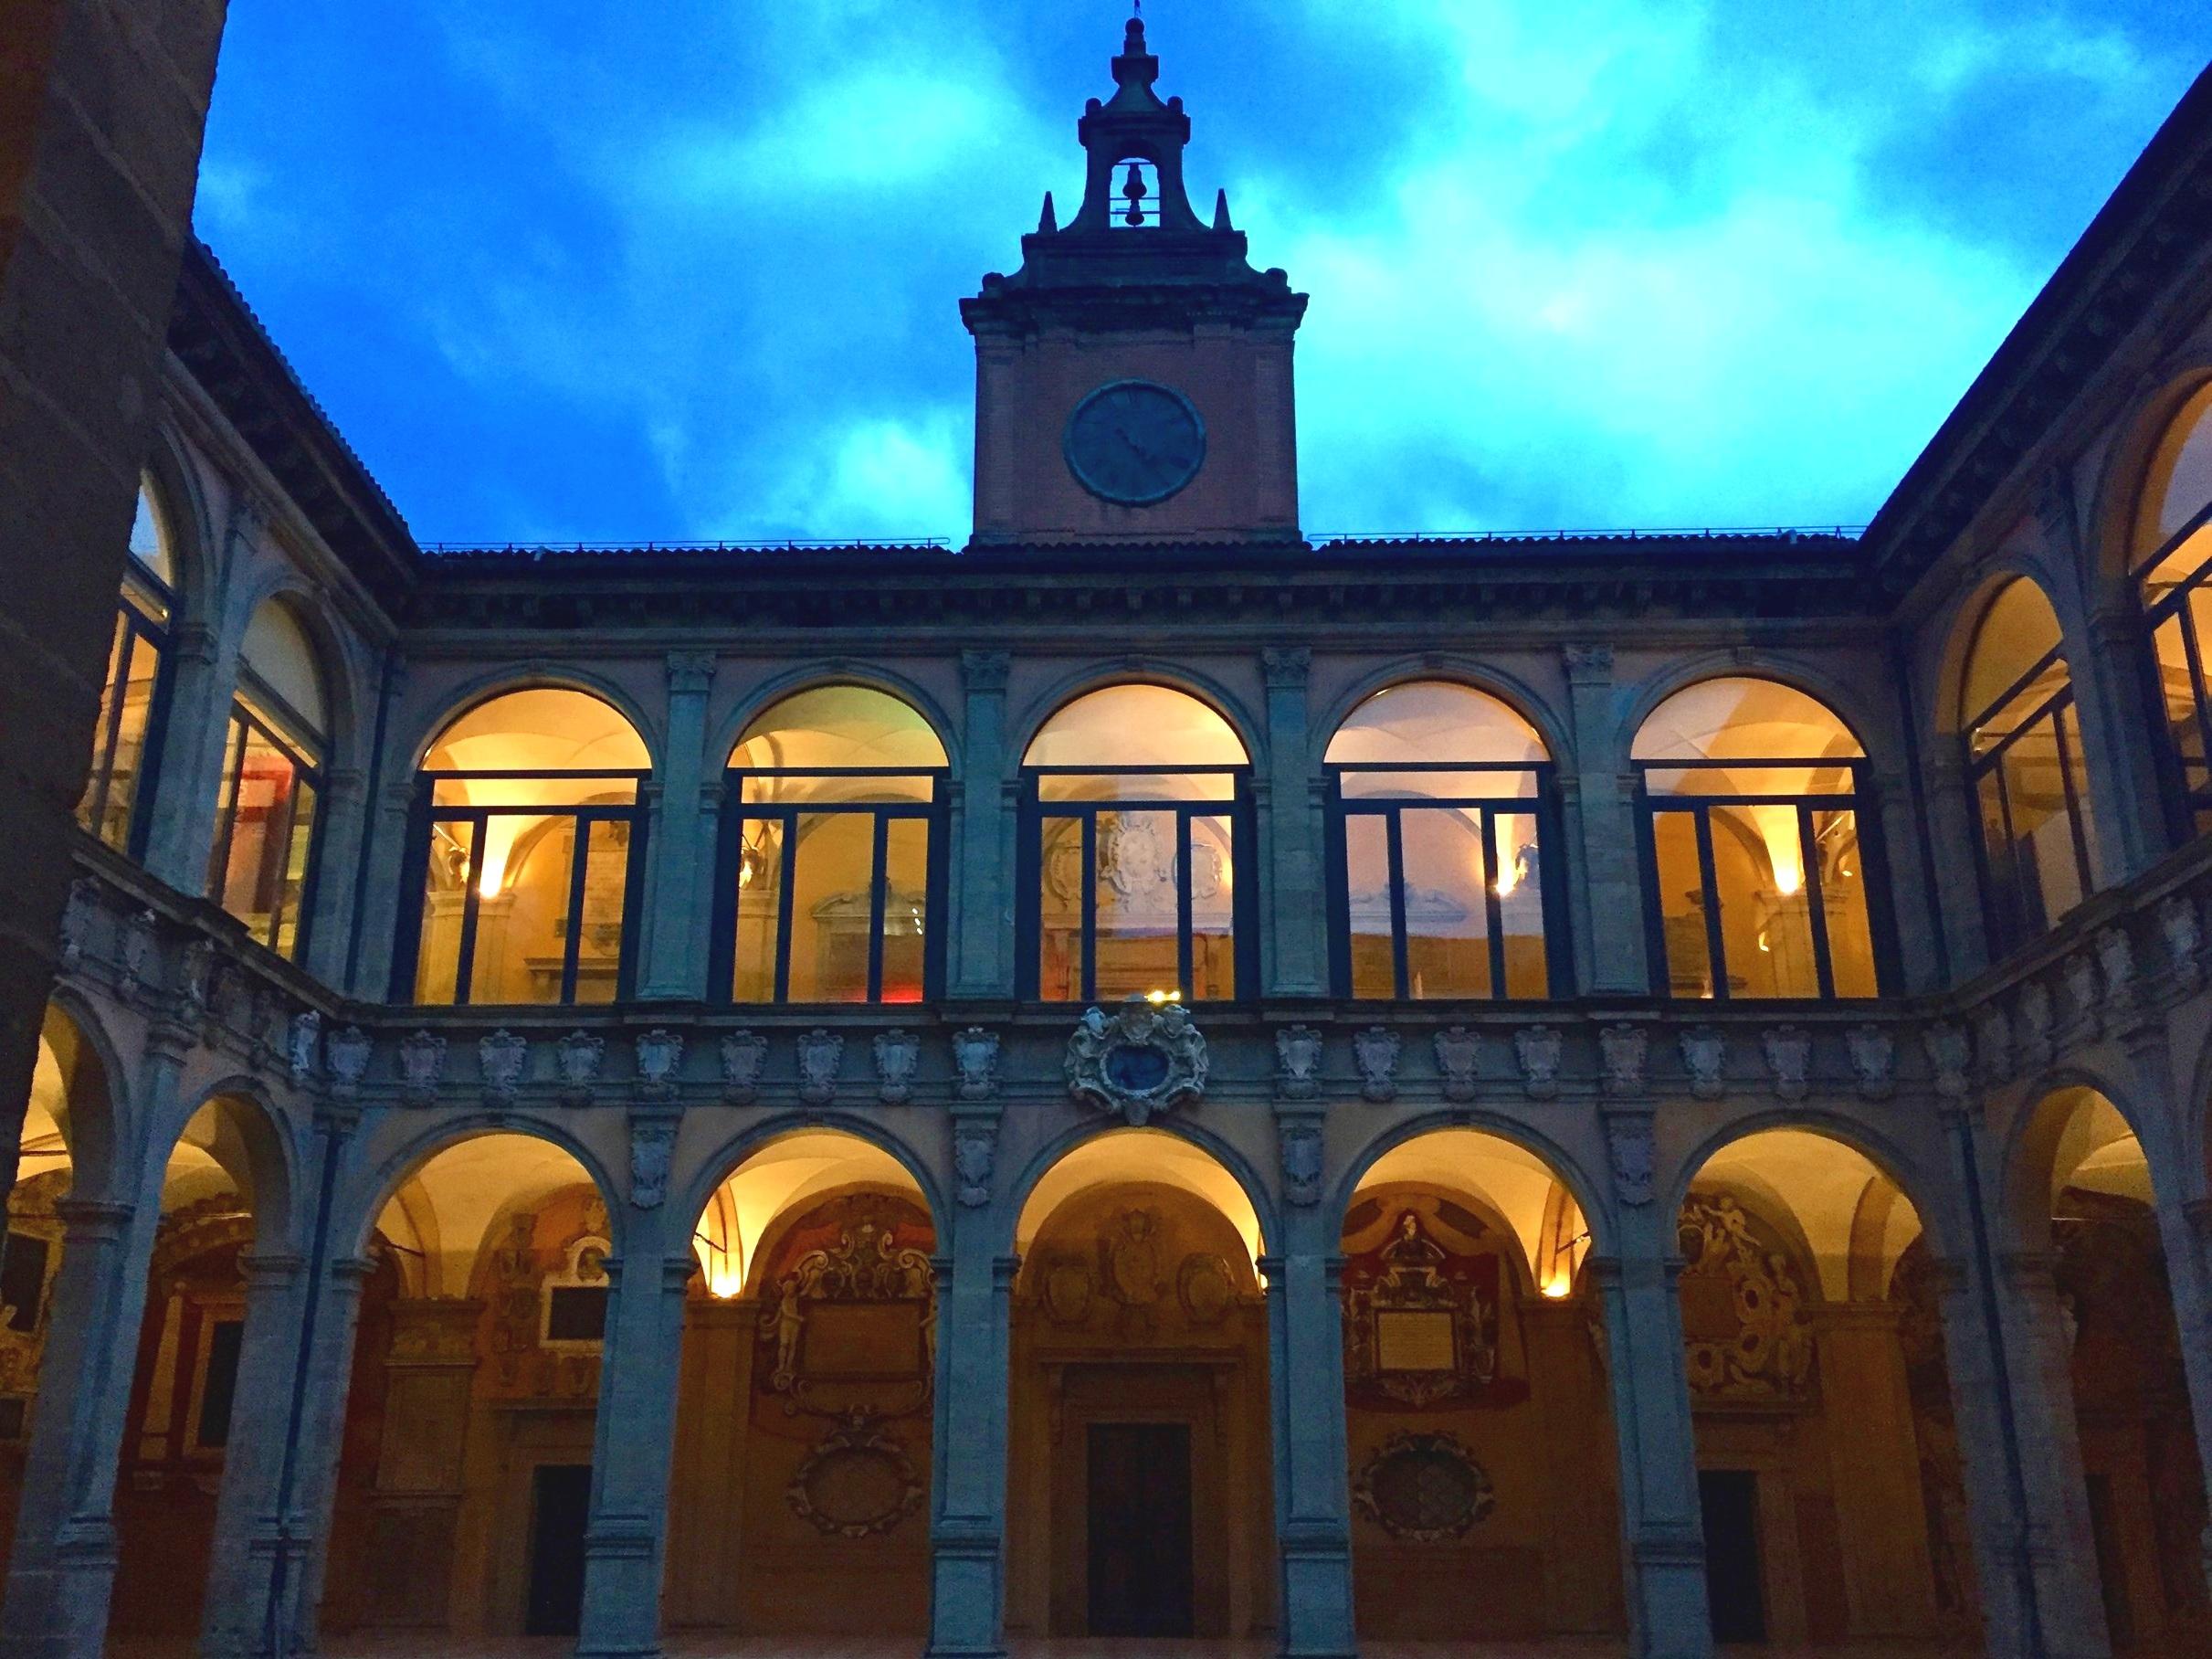 The Archiginnasio palace and public library - Bologna